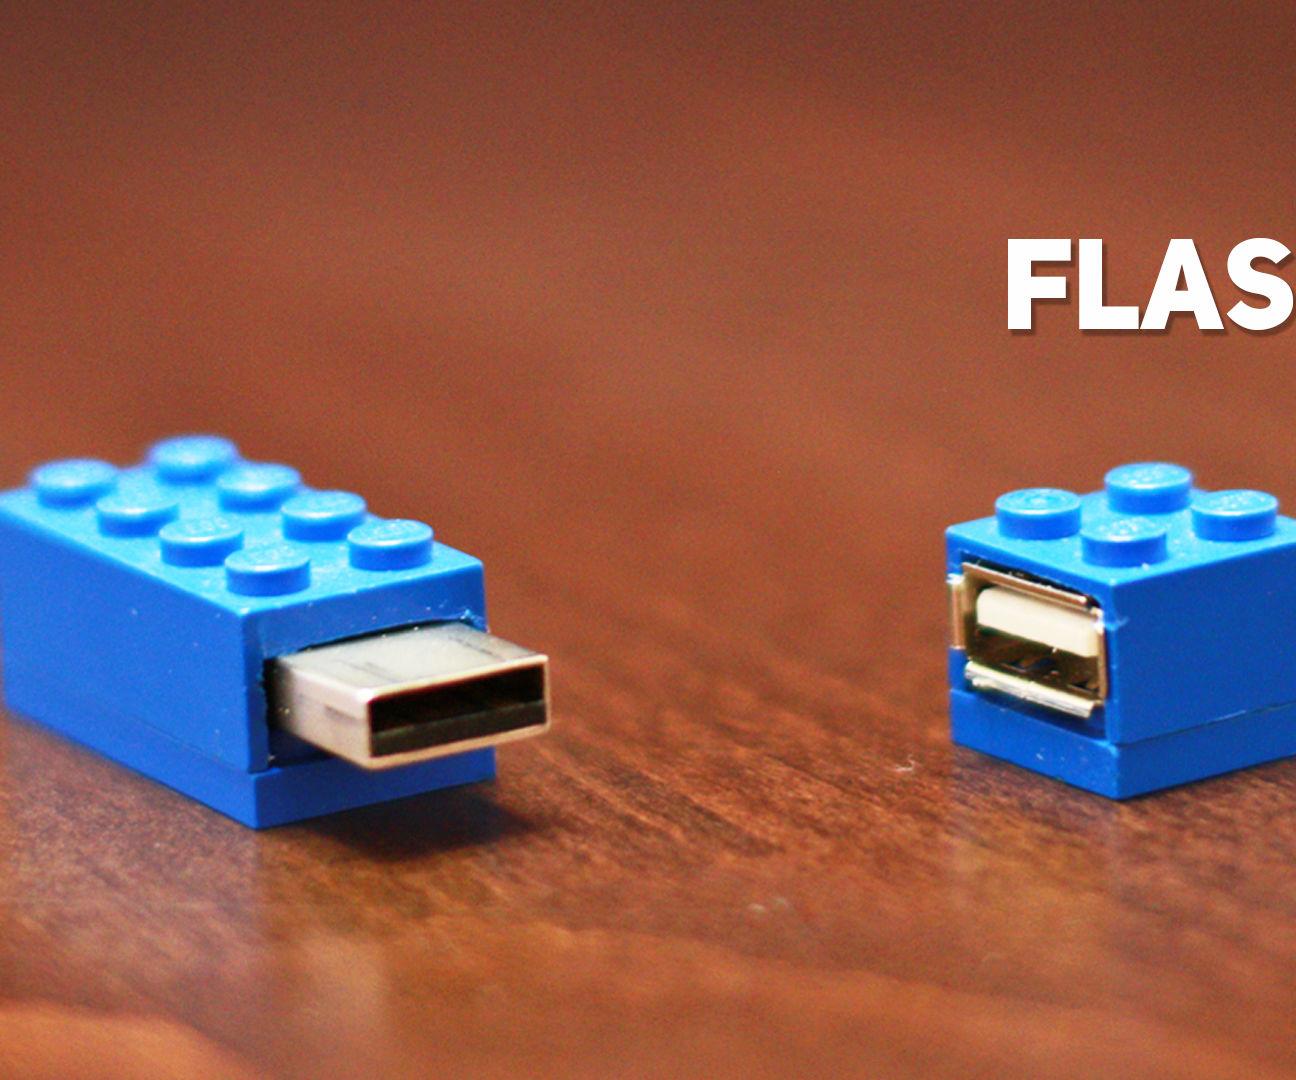 Lego Flash Drive